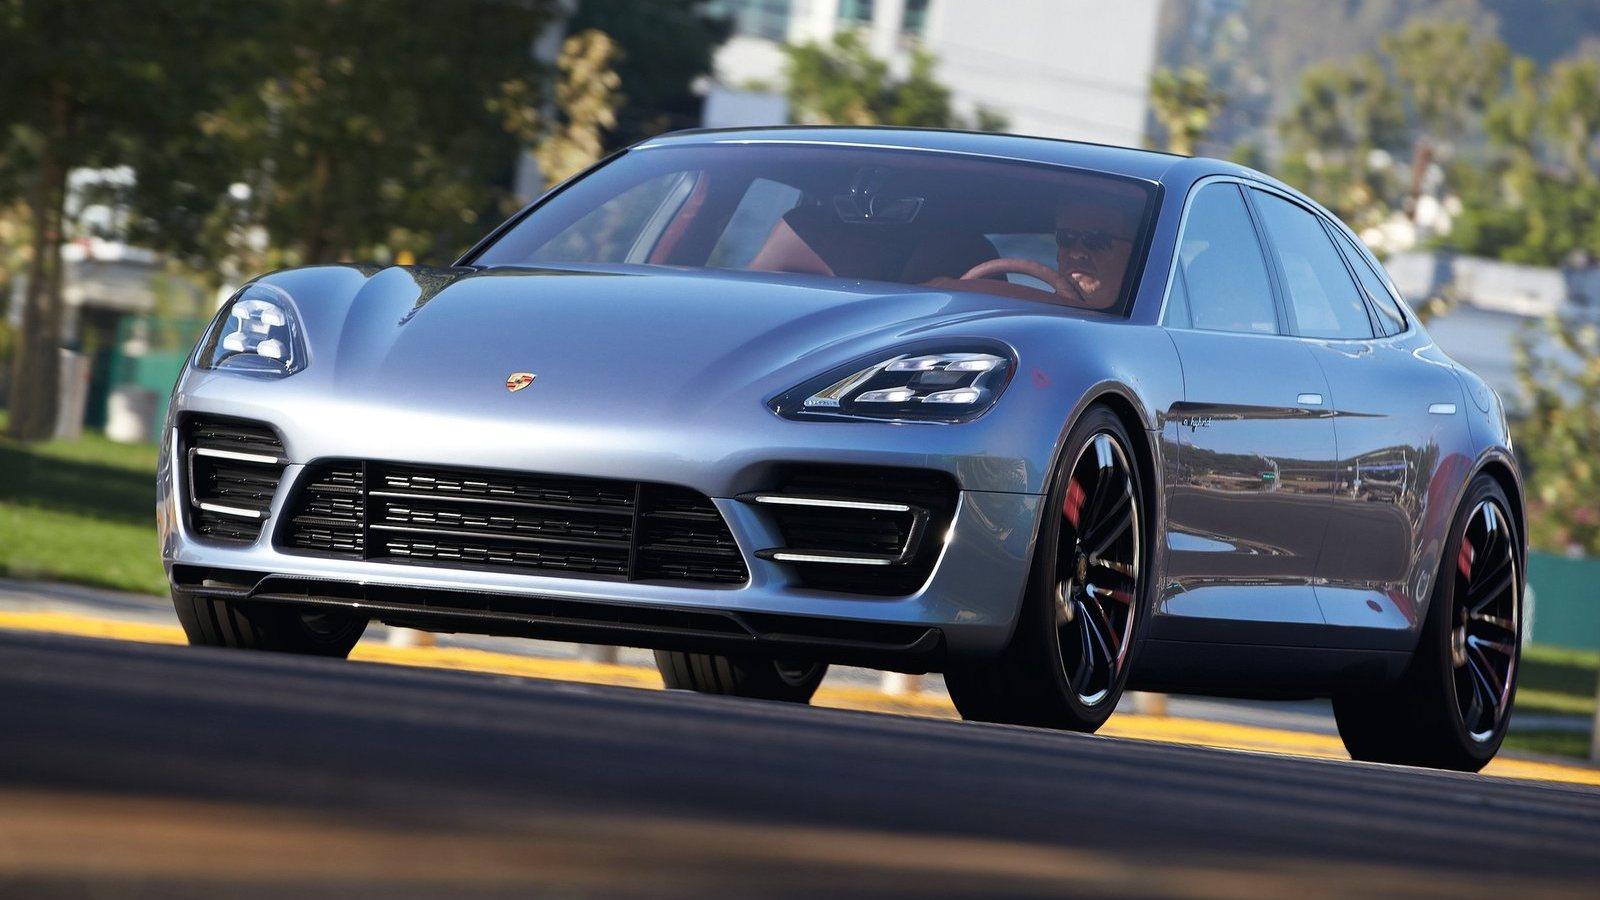 Porsche panamera sport turismo concept auto review porsche panamera sport turismo concept sciox Image collections